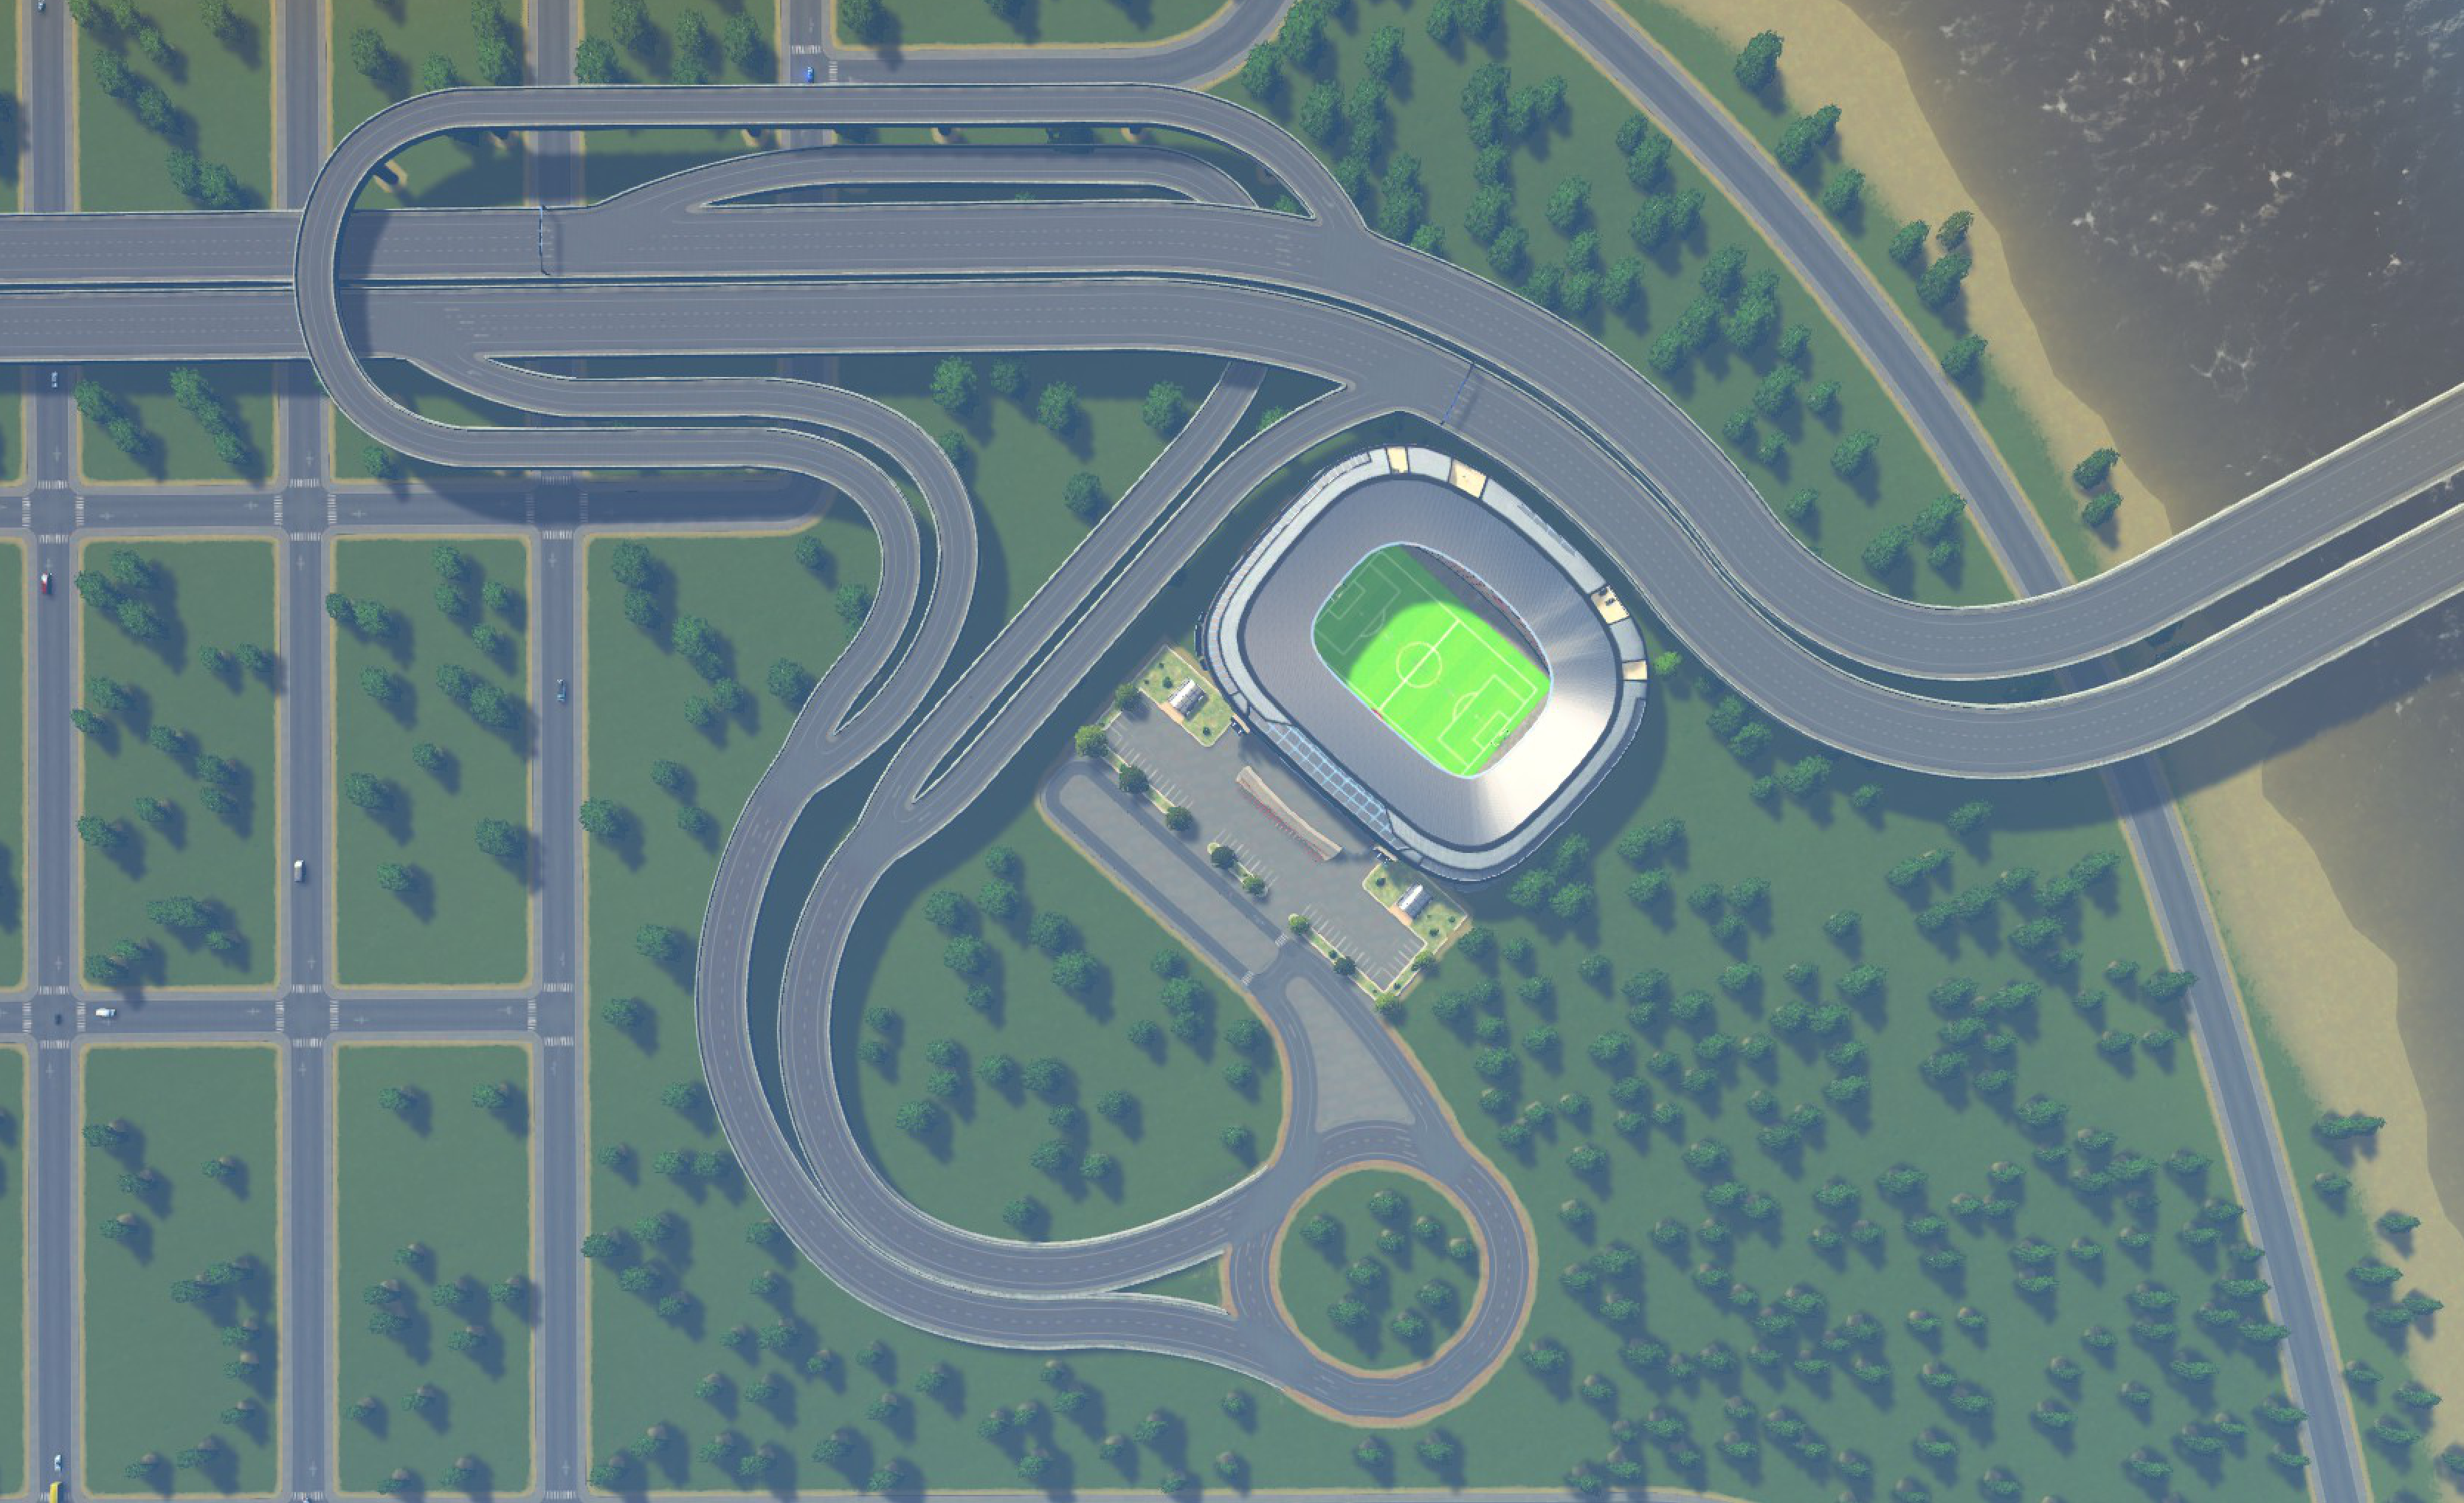 stadiuminterchange2-png.316577